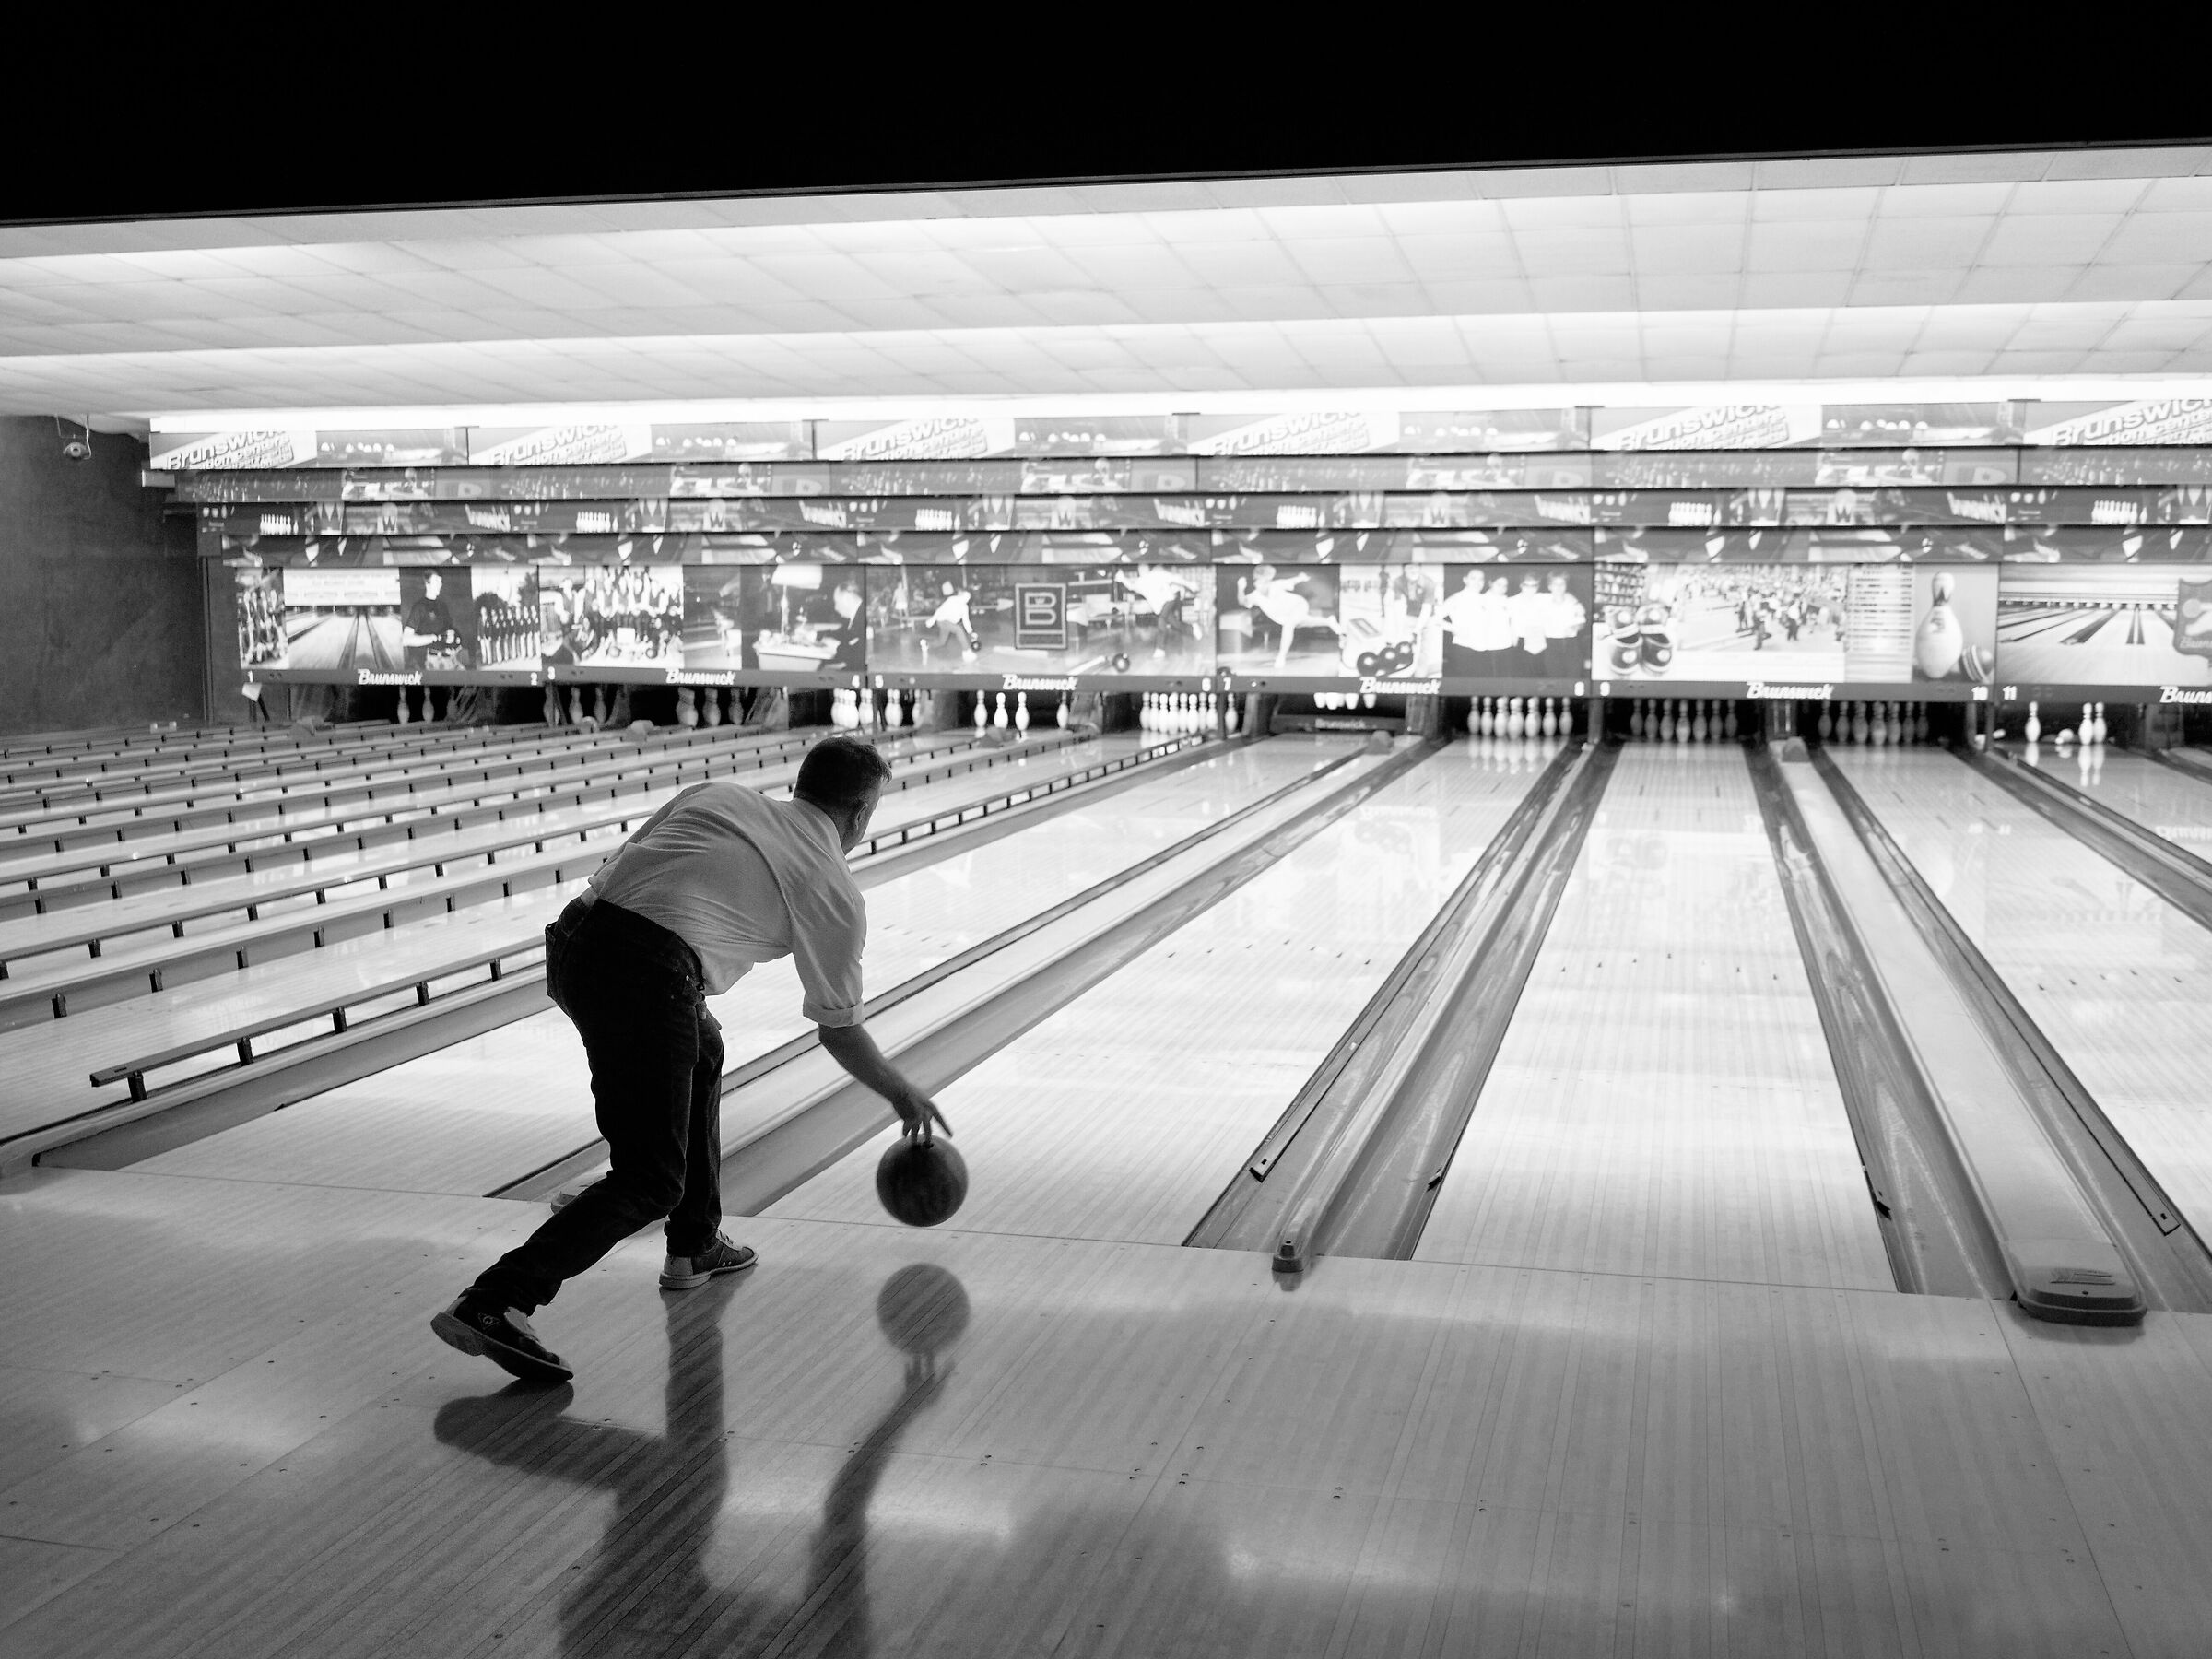 Bowling...